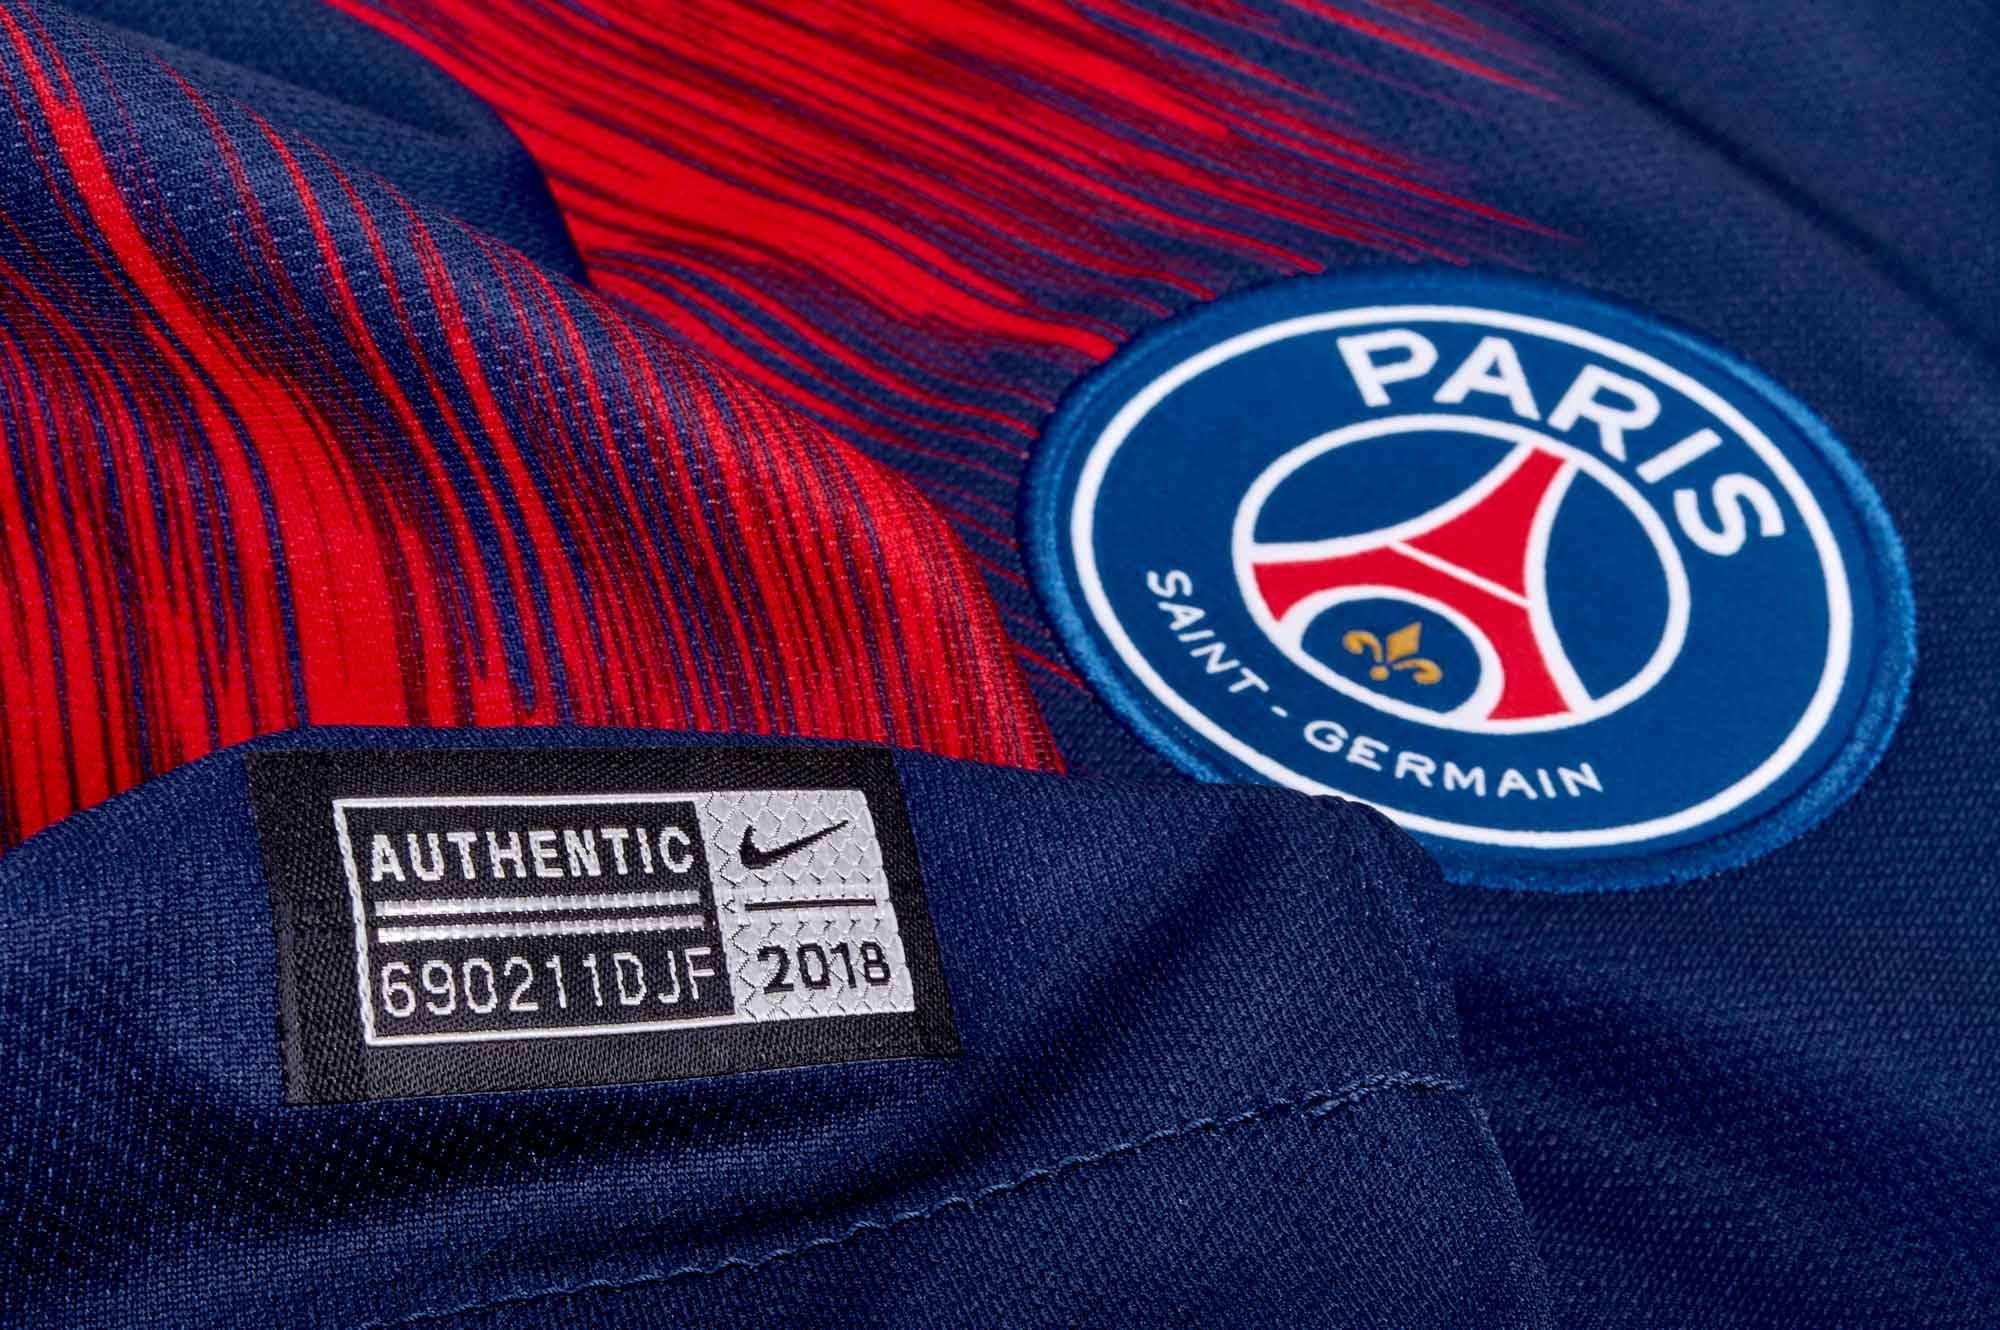 6676ff77a5a44 Nike PSG Home Jersey 2018-19 - SoccerPro